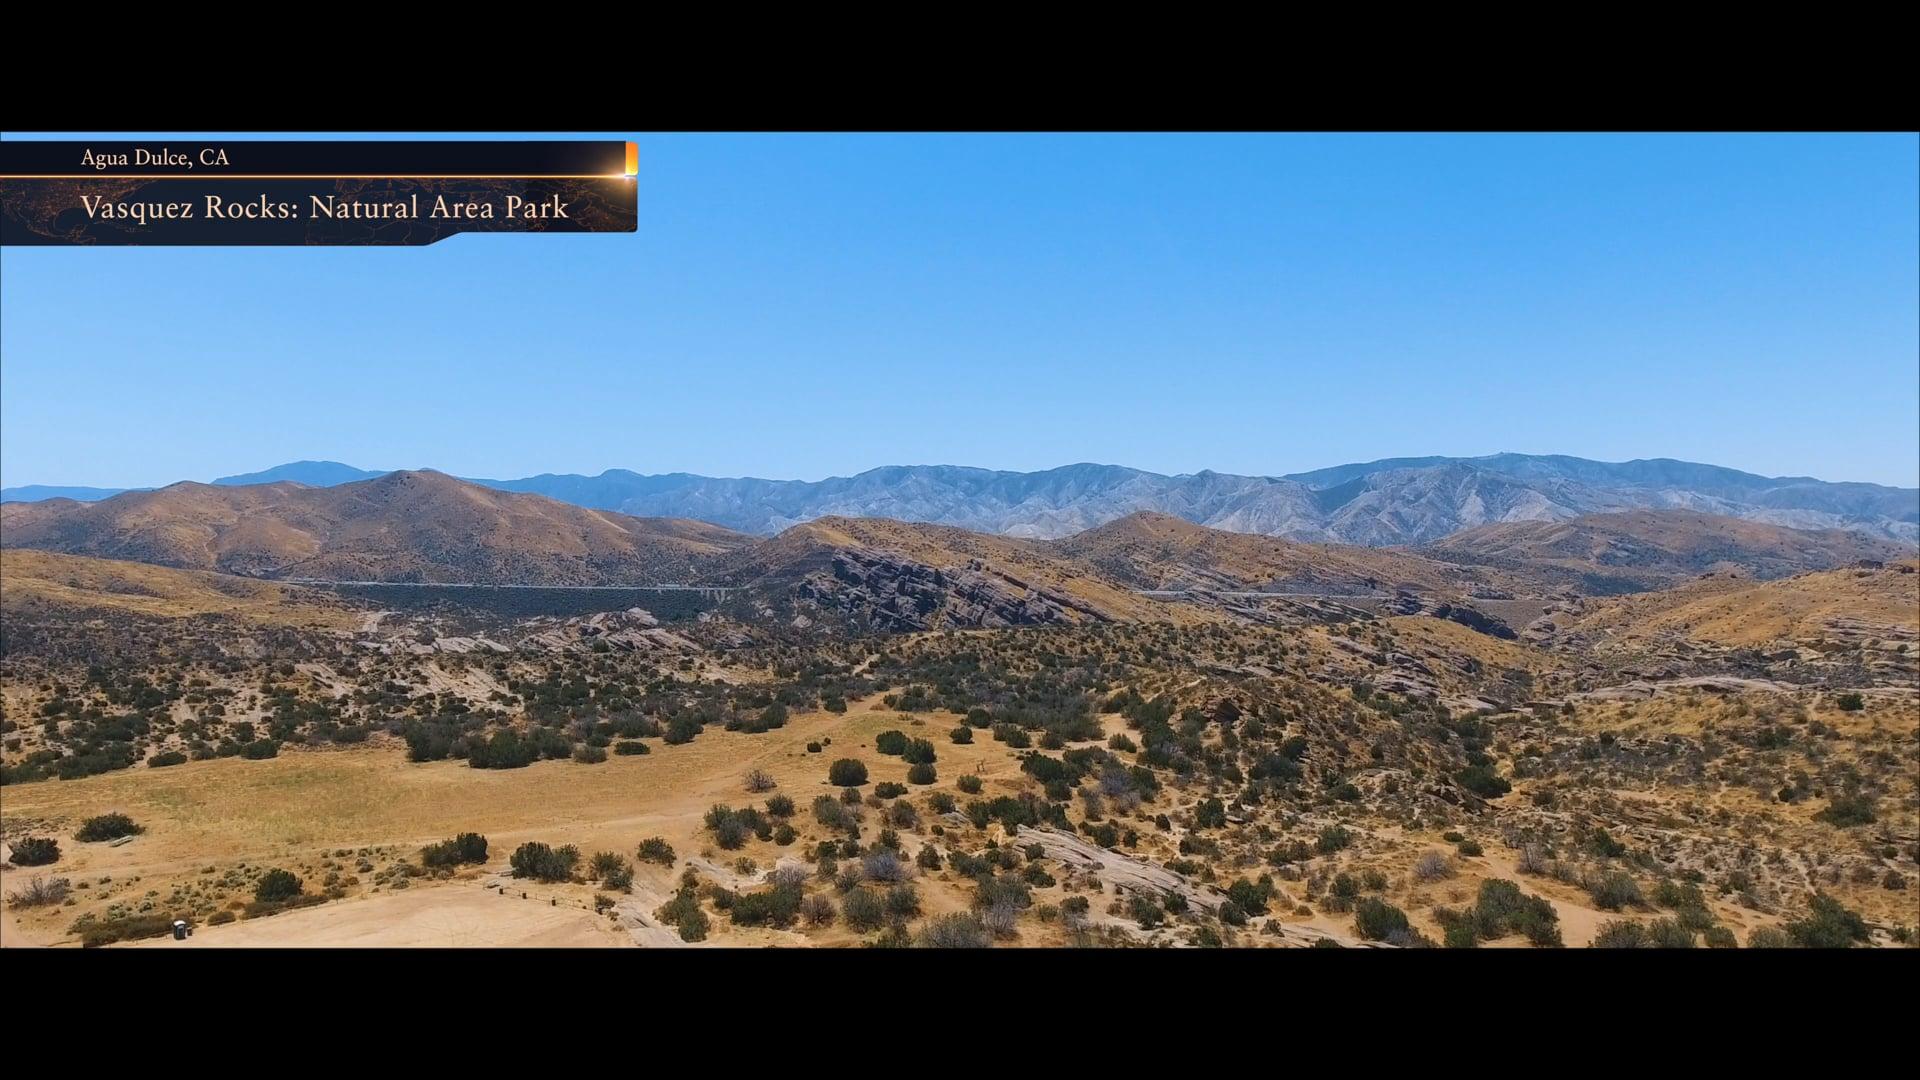 Views From Above - Flight 3 - Vasquez Rocks: Agua Dulce, CA